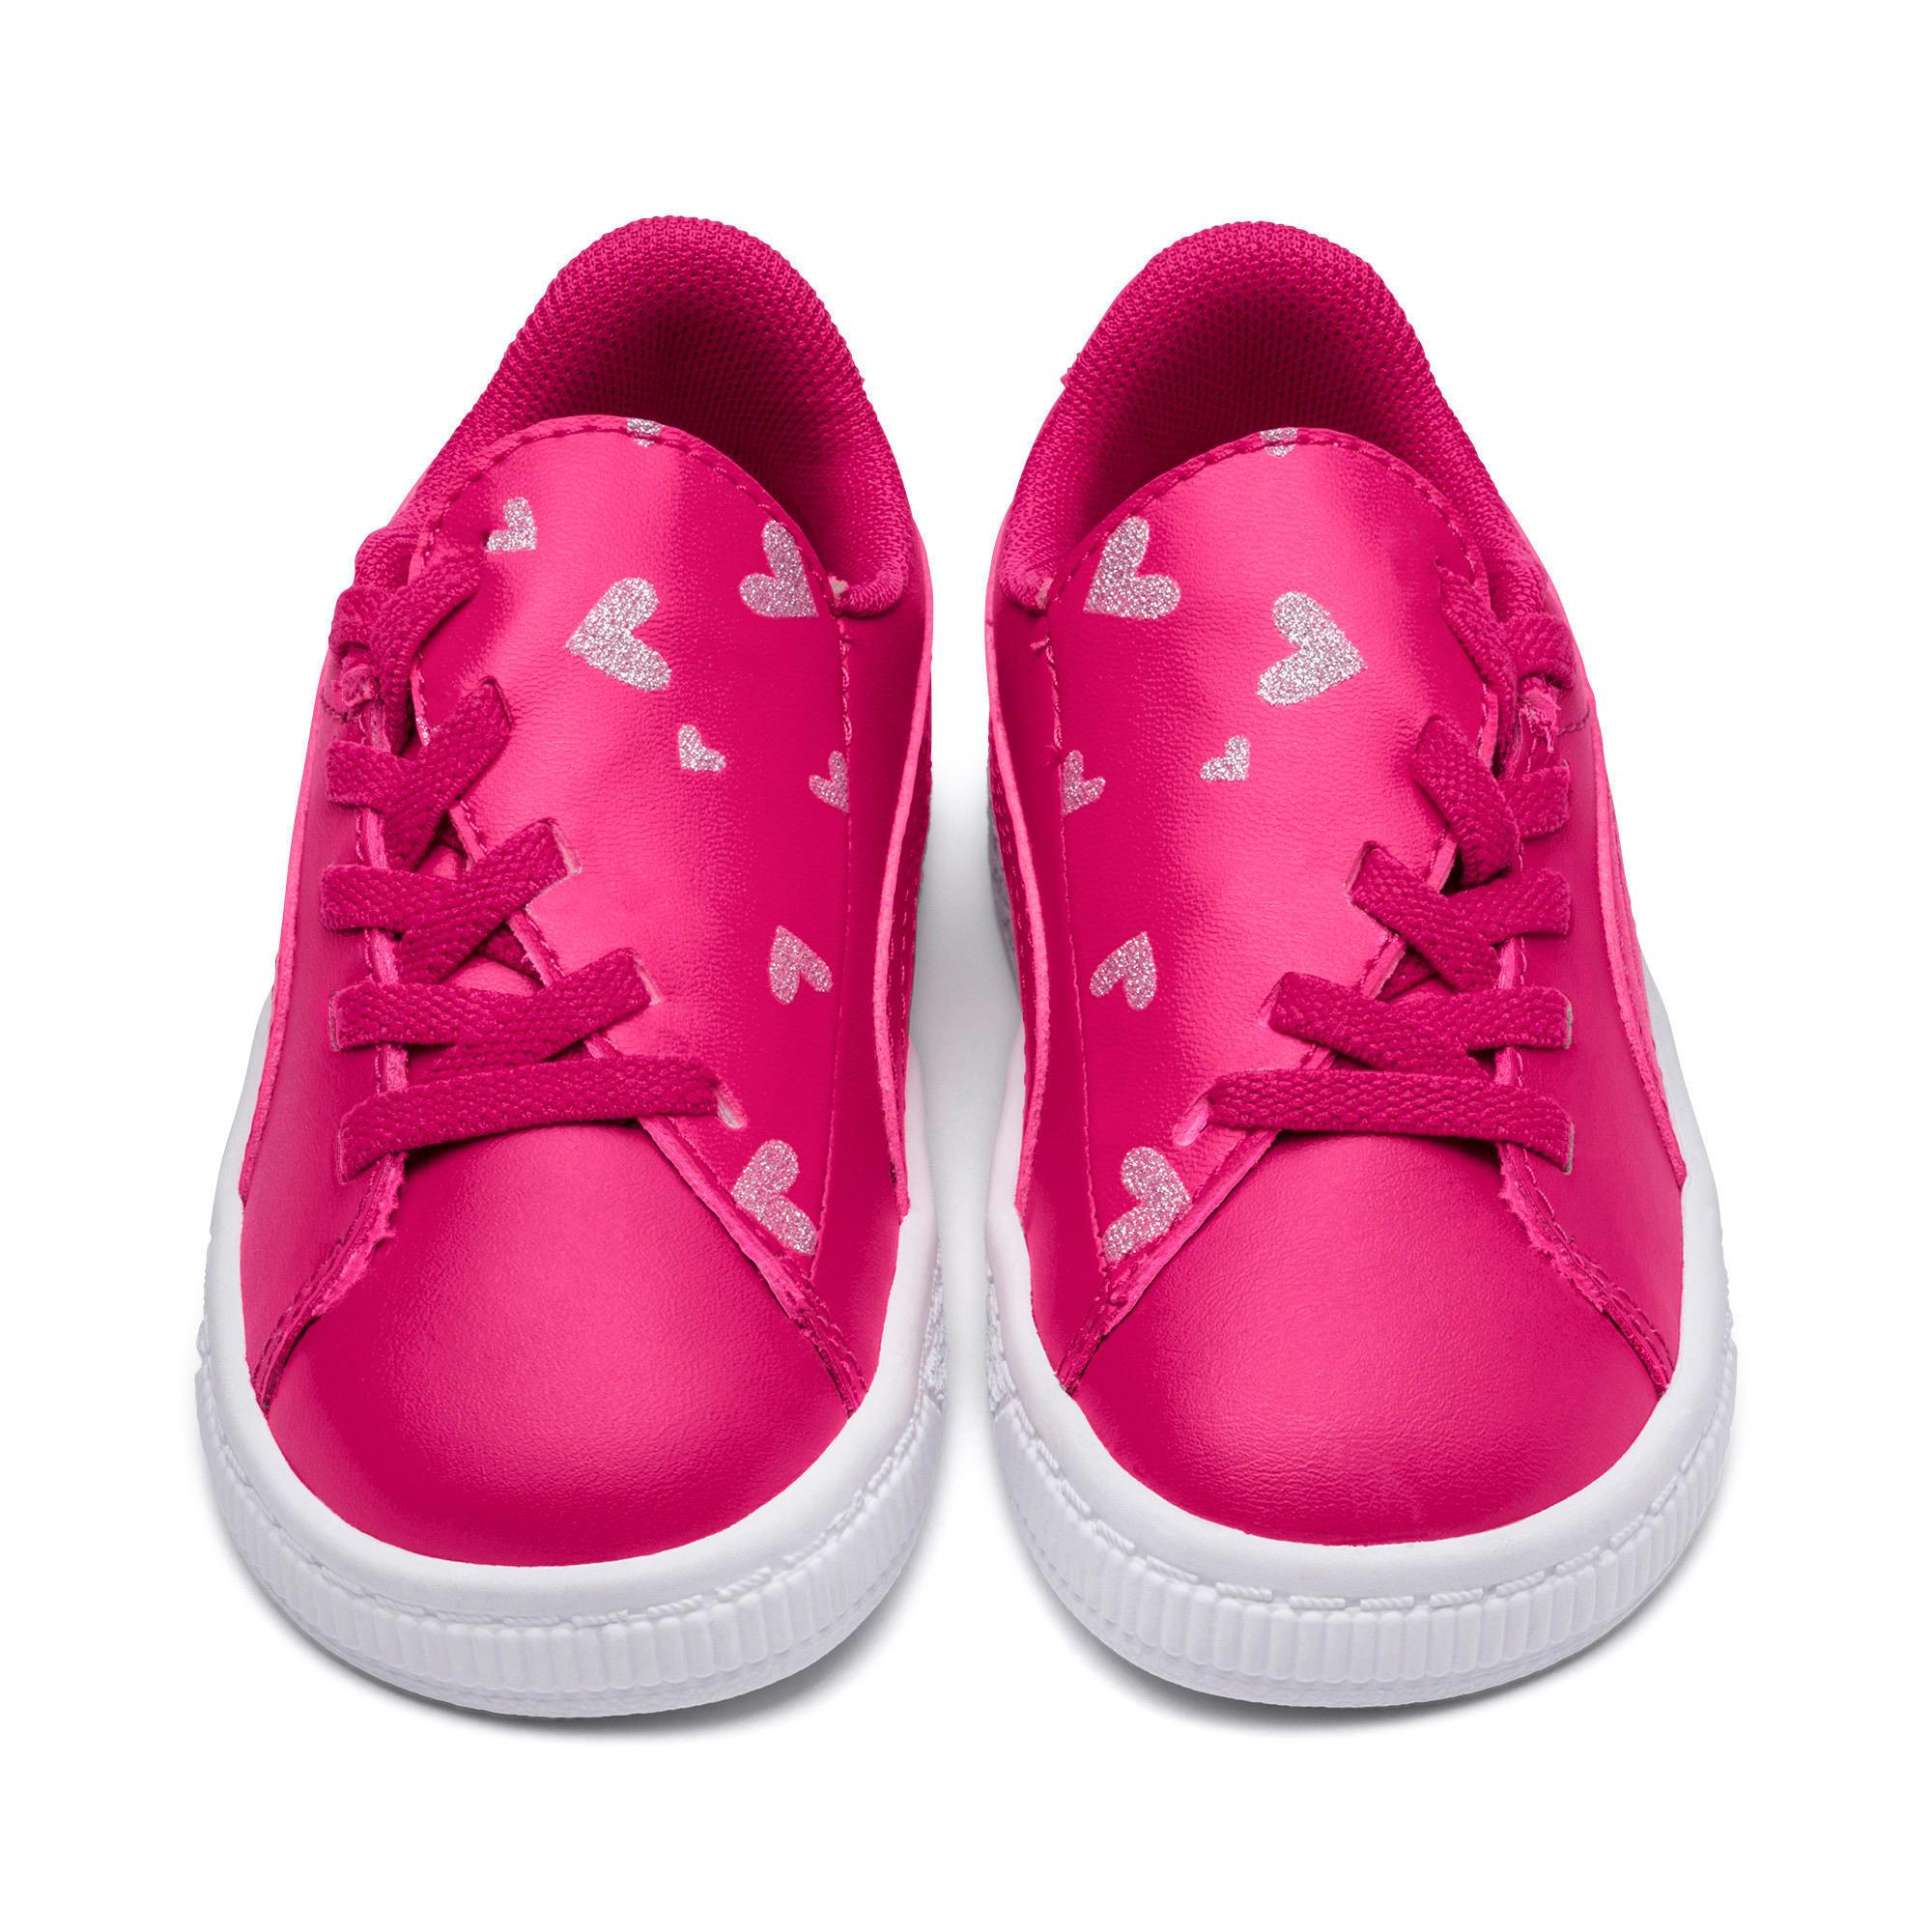 Thumbnail 2 of Basket Crush Glitter Hearts AC Toddler Shoes, Fuchsia Purple-Puma White, medium